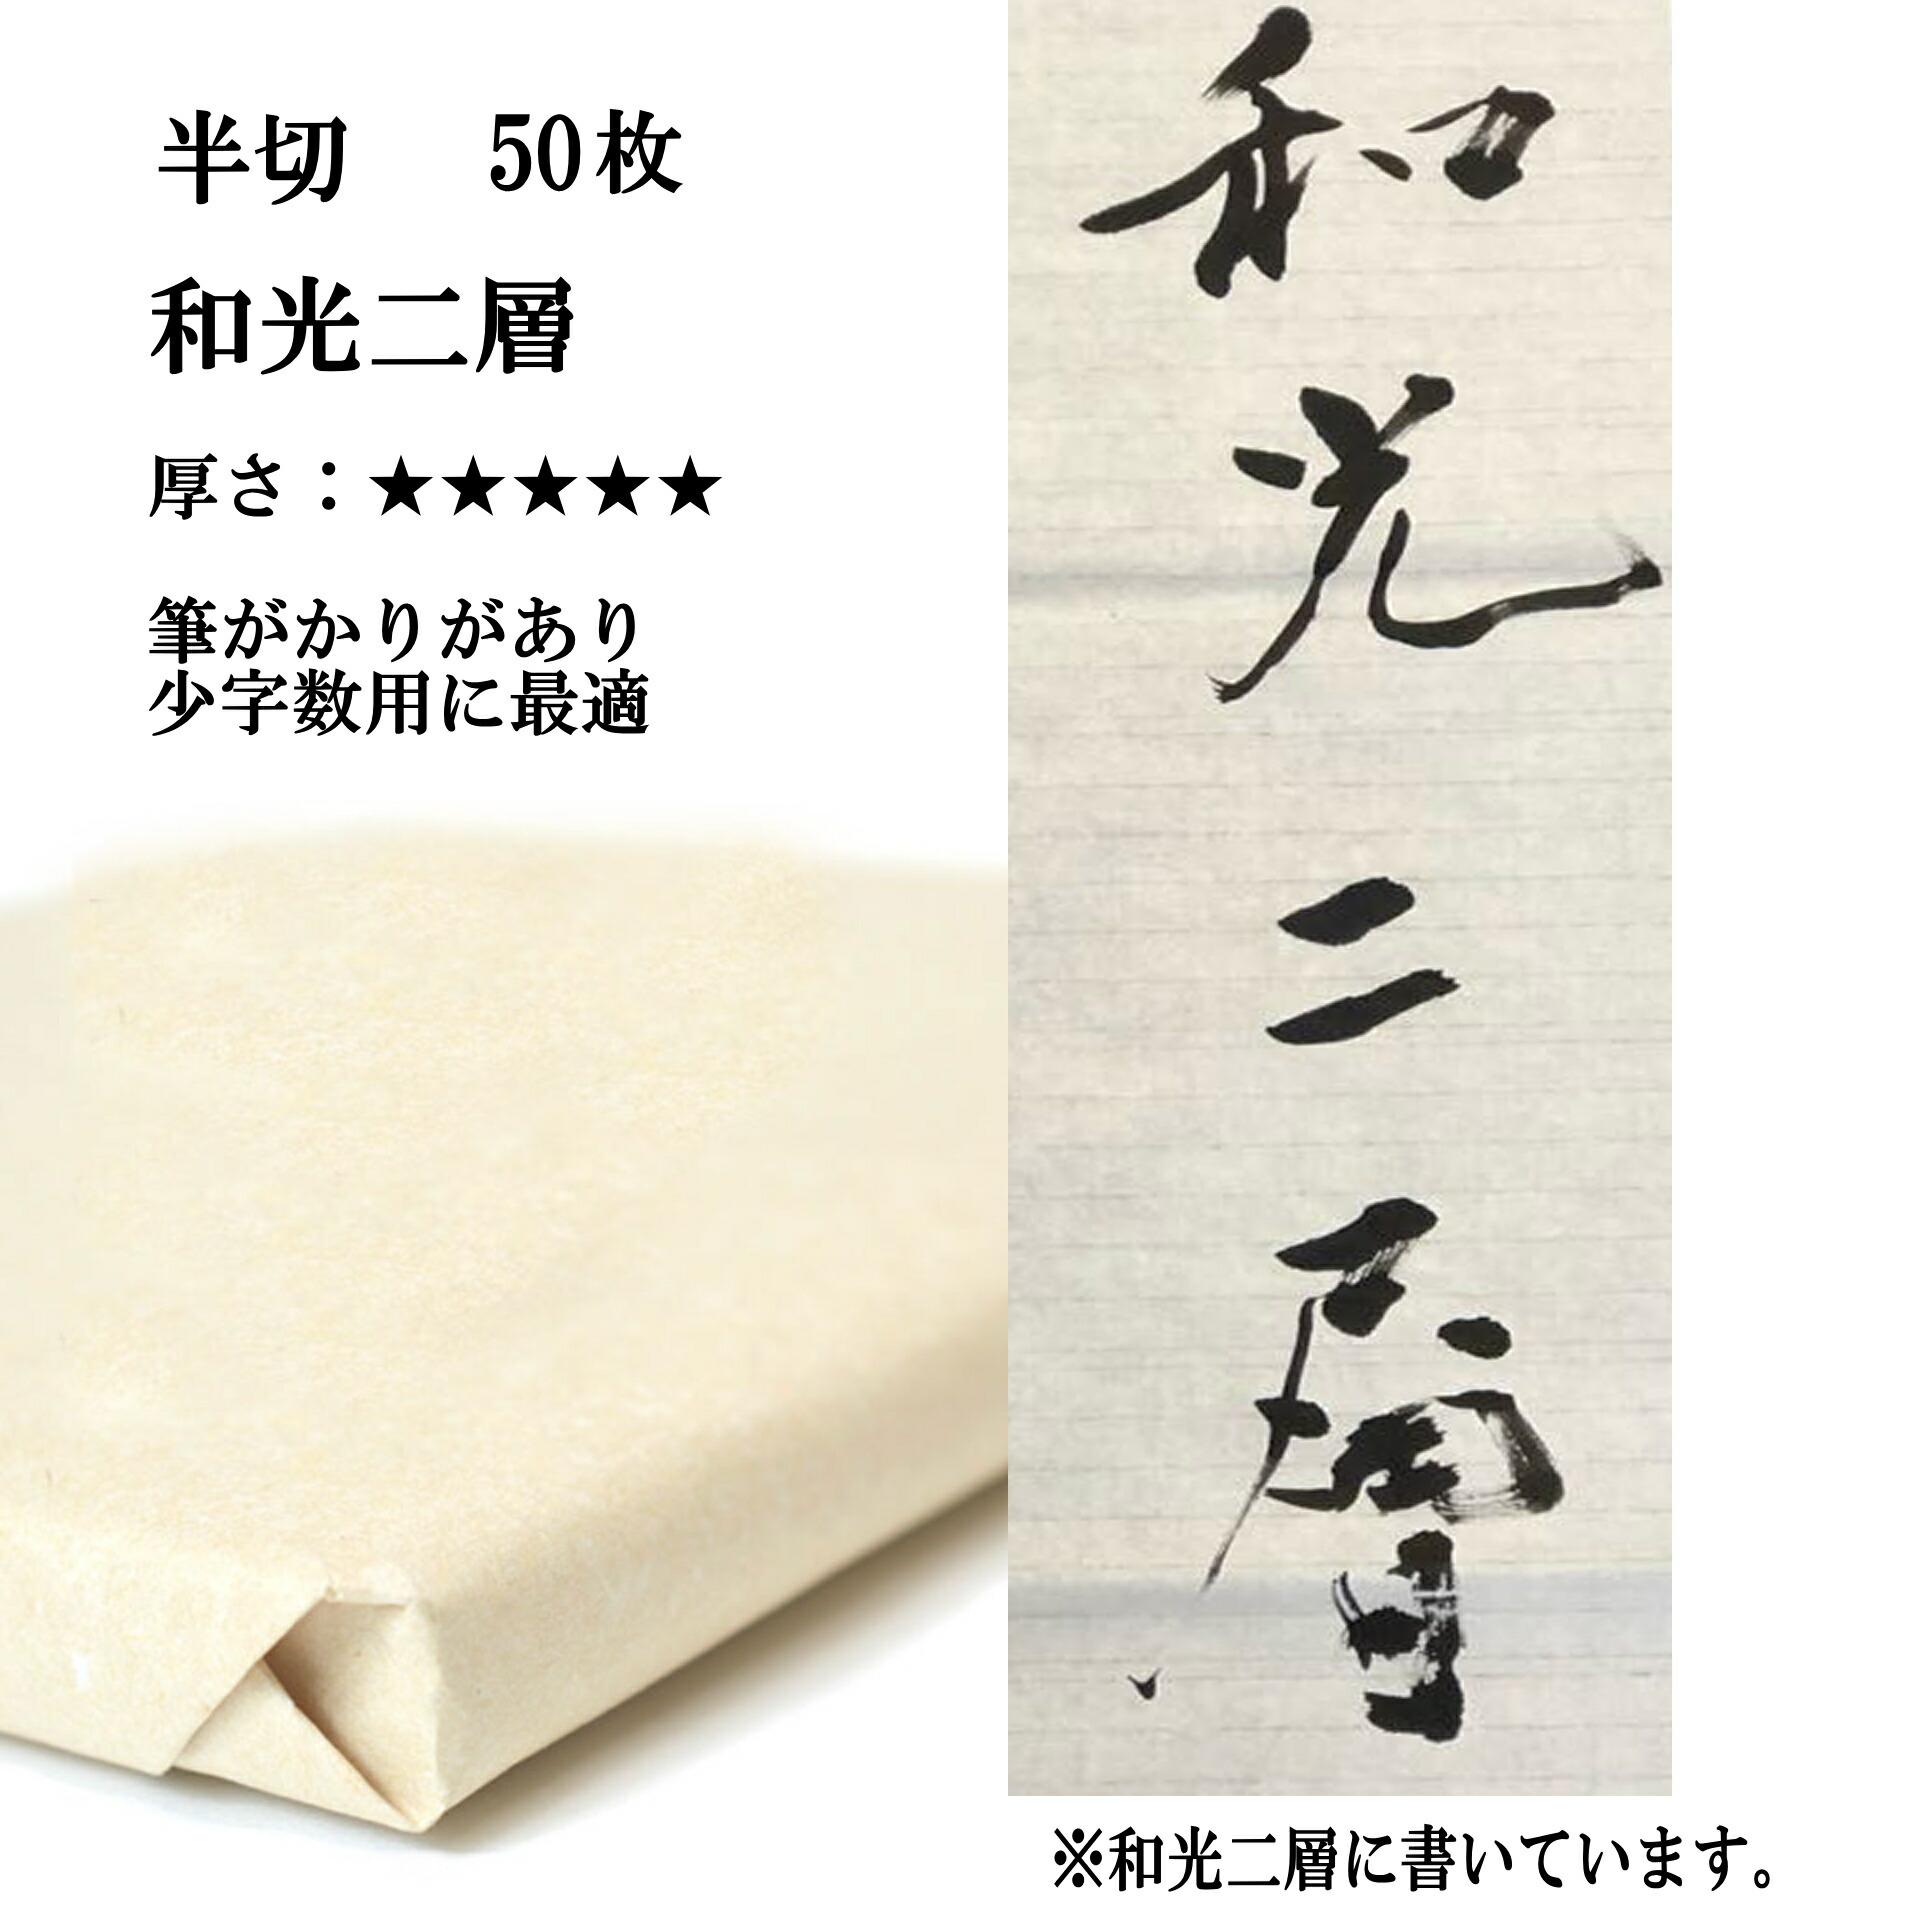 手漉き画仙紙 和光二層紙 50枚